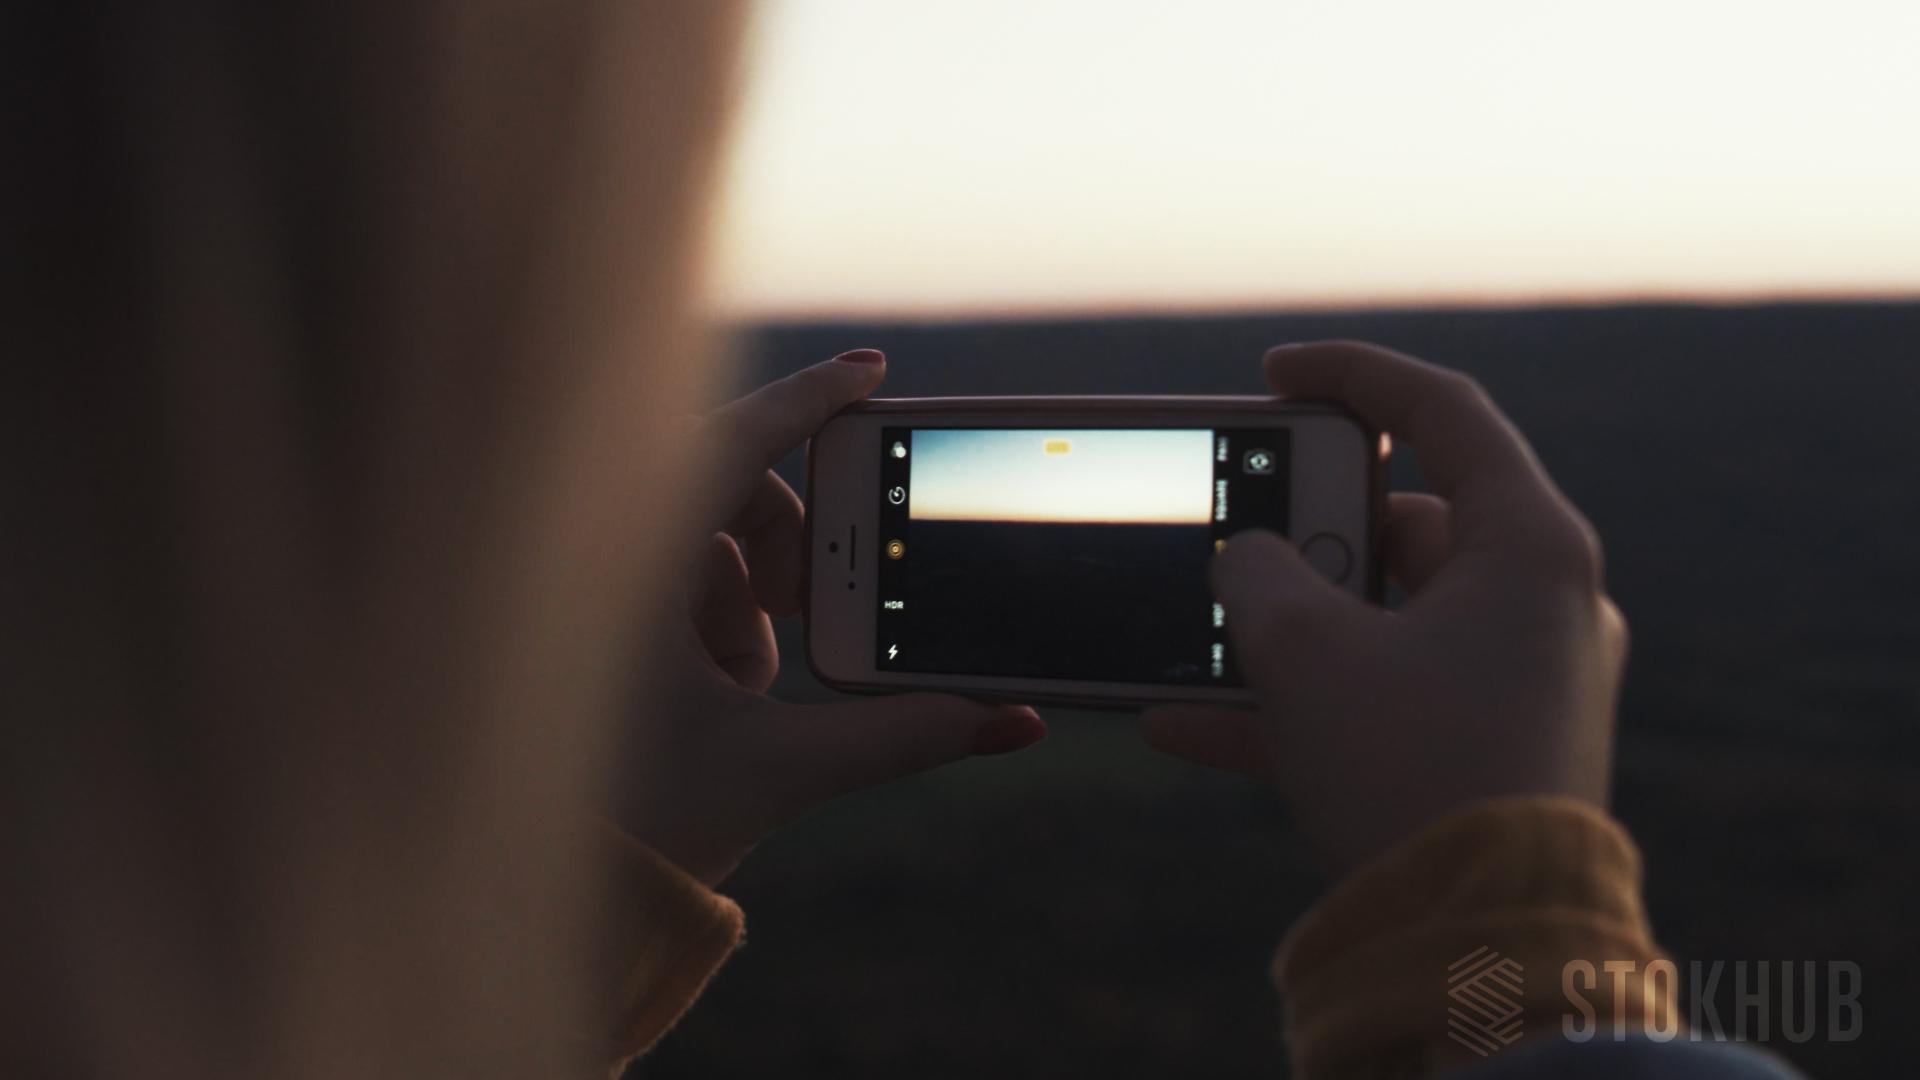 Stokhub-Iphone-1.jpg